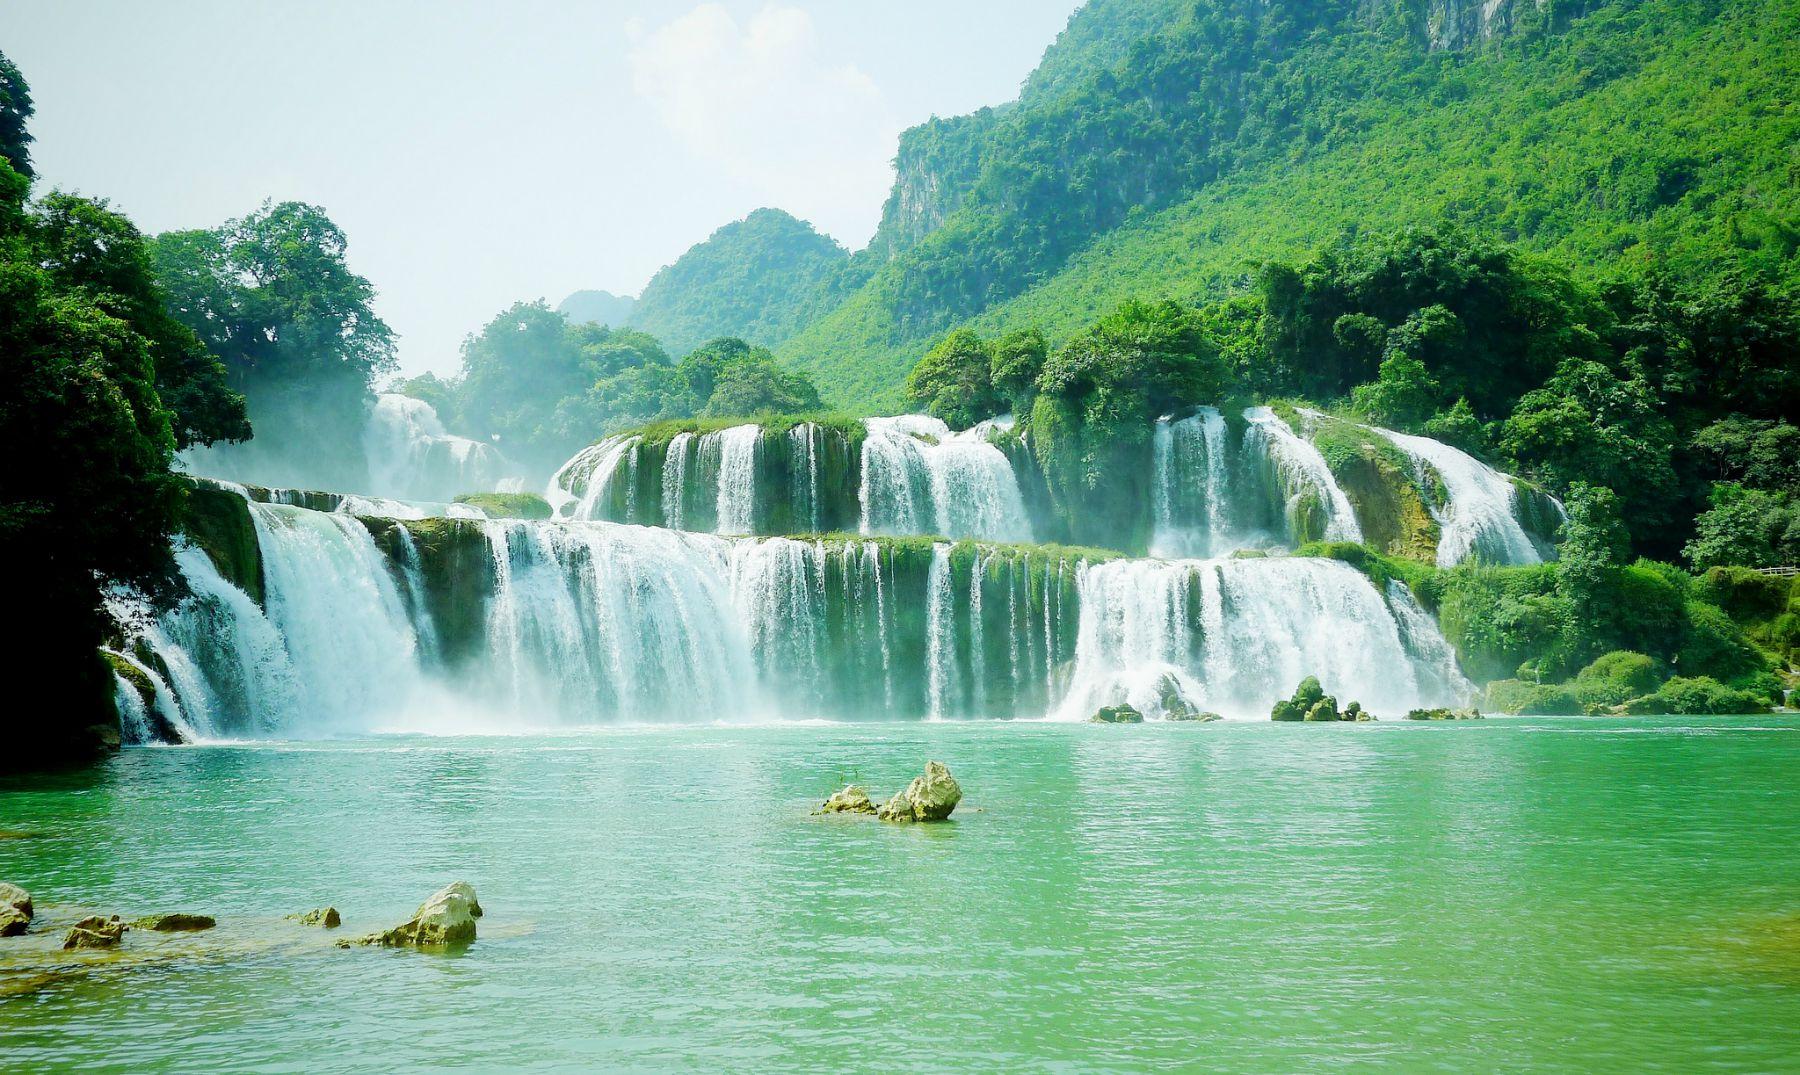 11 Consejos Para Fotografiar Impresionantes Cataratas Con: Cataratas Ban Gioc-Detian, Un Lugar único